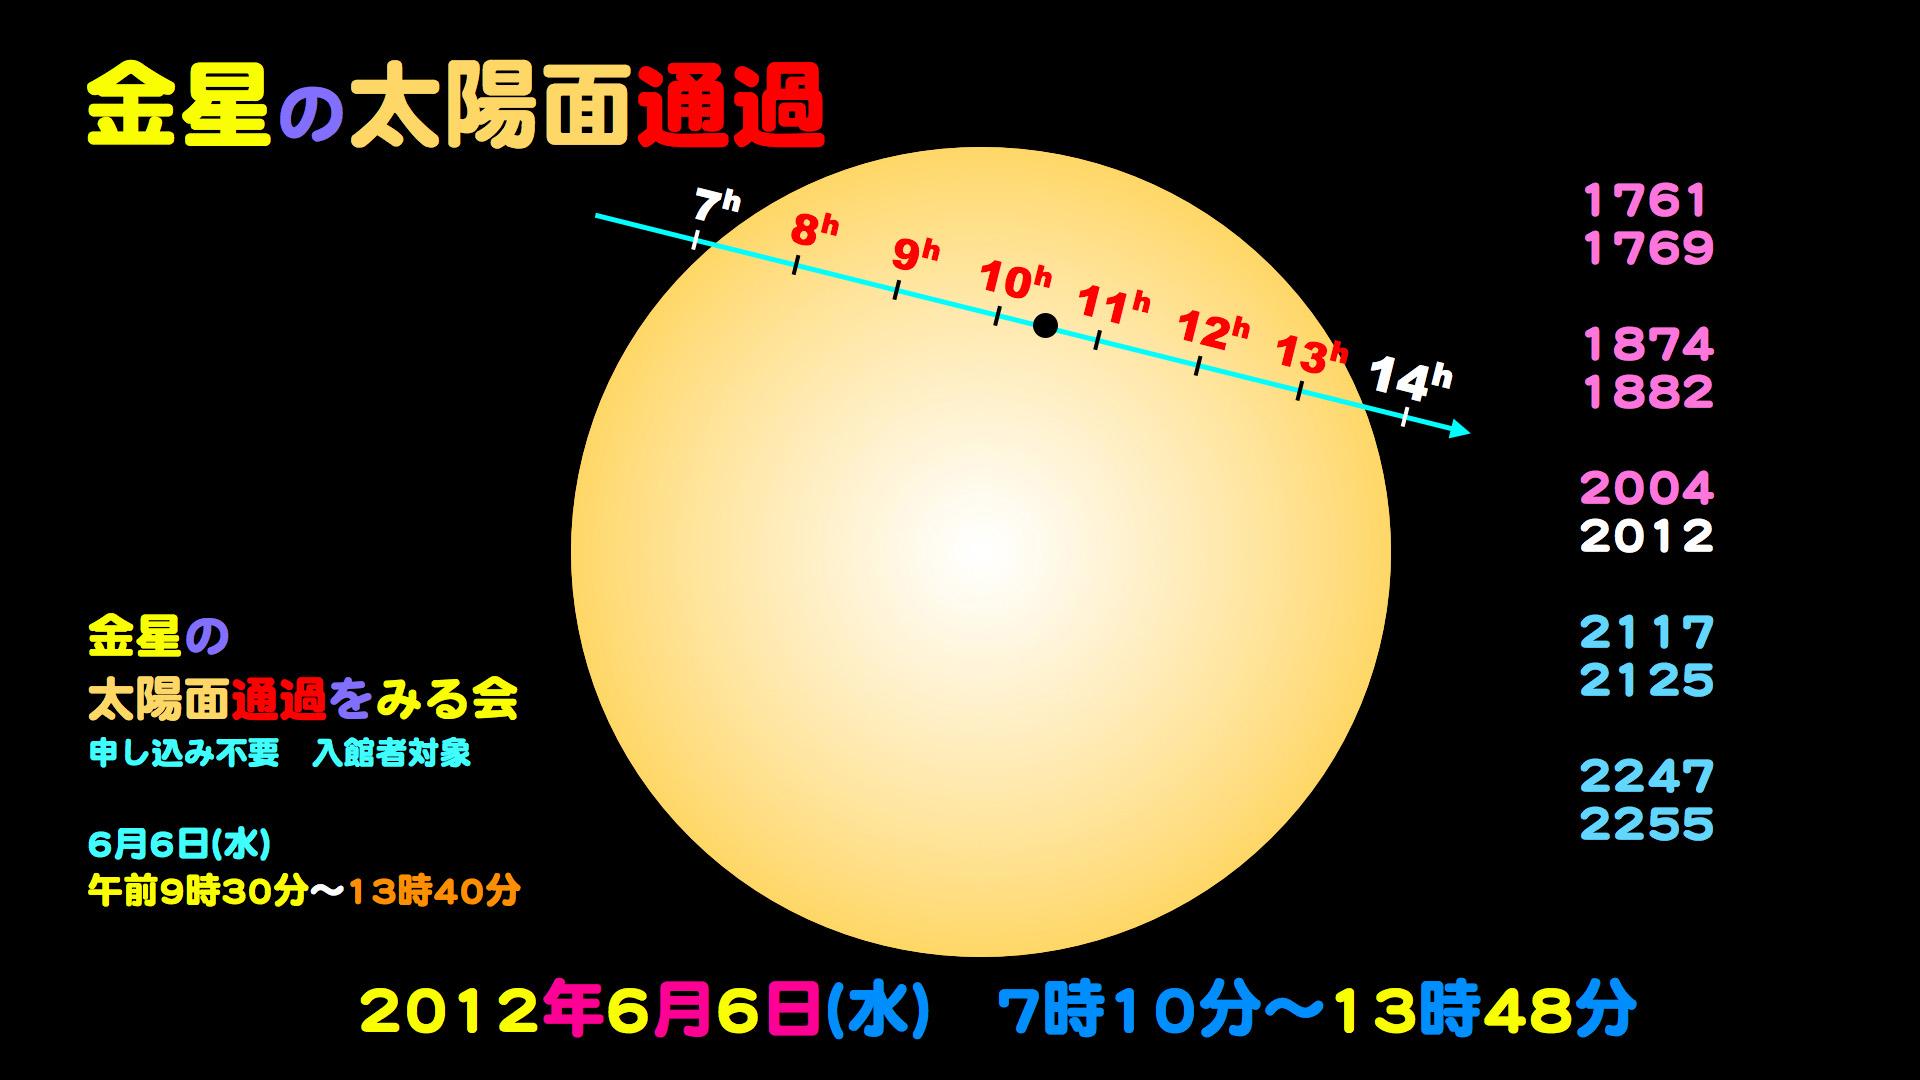 http://www.ncsm.city.nagoya.jp/study/astro/M_12-05IP_after.041_2.jpg